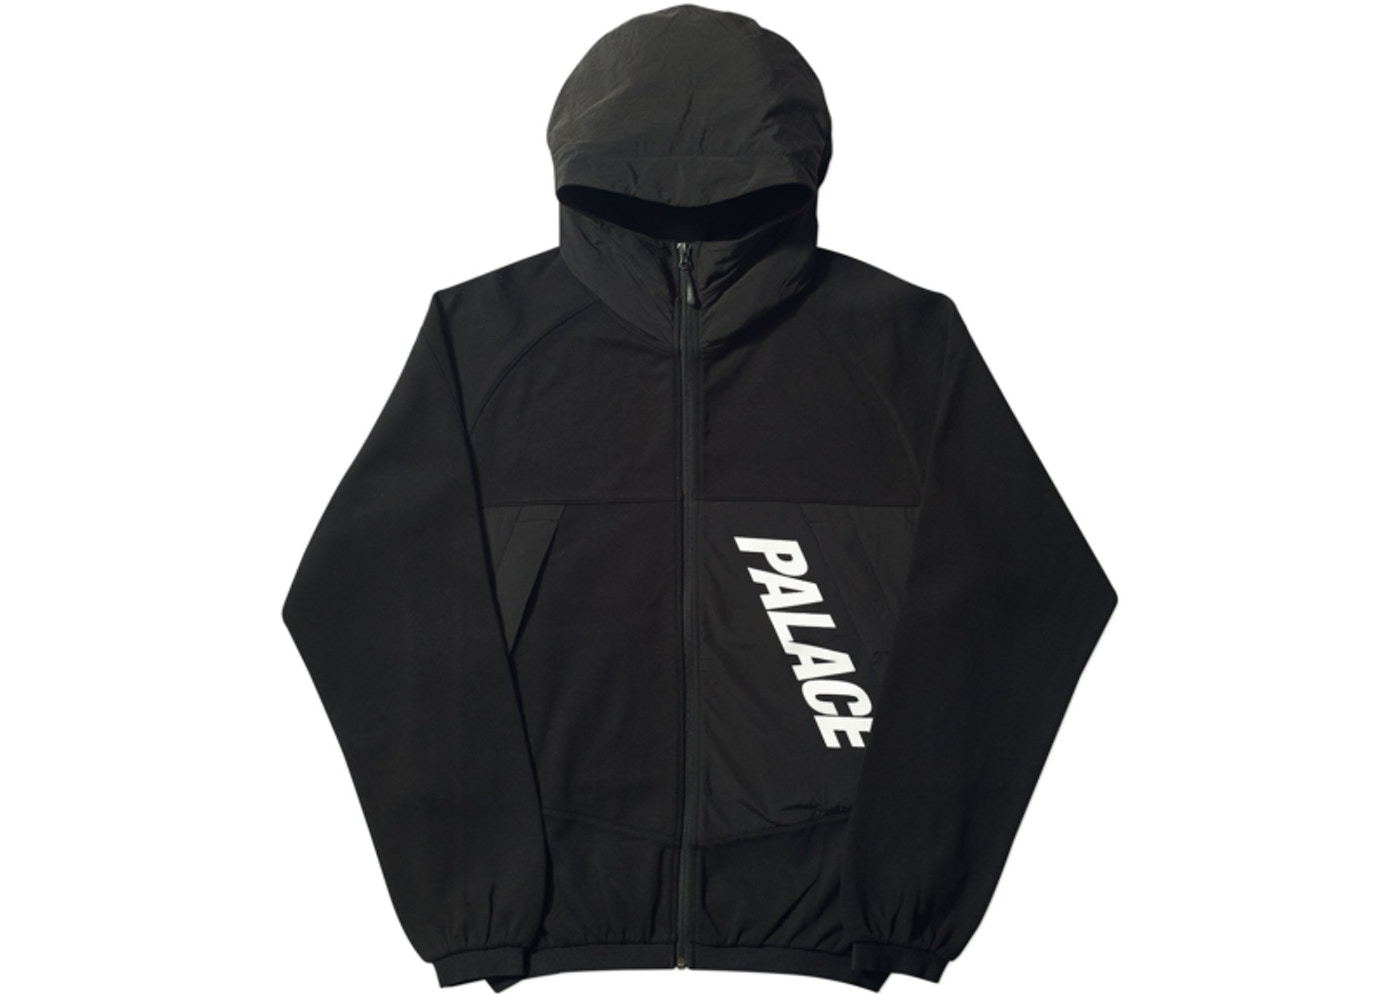 2472f0595fa2 Size M. View All Bids. Palace P-Tech Track Jacket Black Black. P-Tech Track